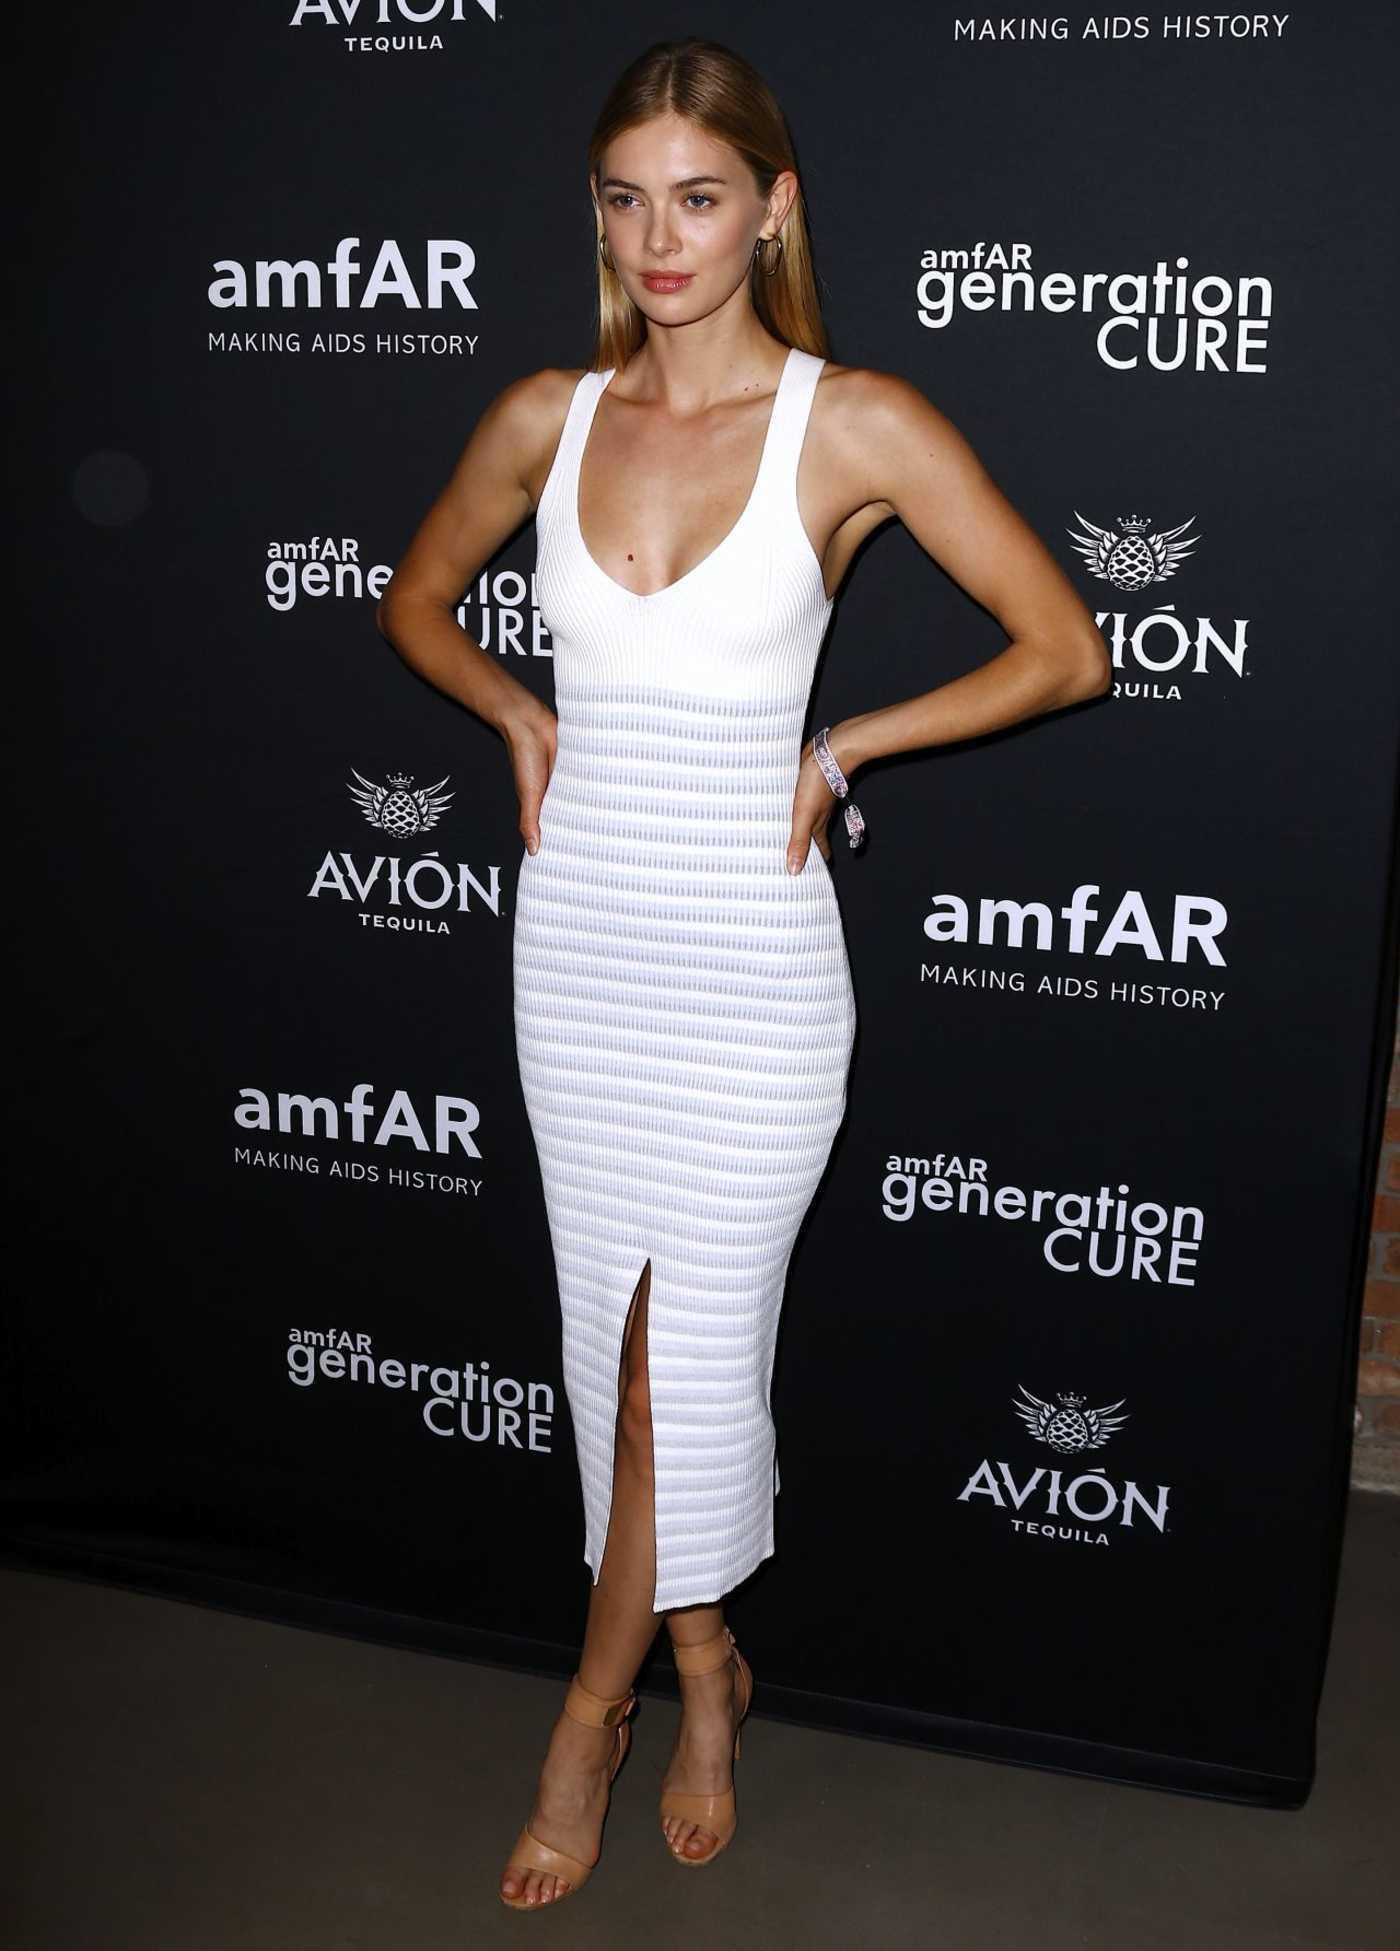 Megan Williams at amfAR GenCure Solstice 2018 at Second in NYC 06/21/2018